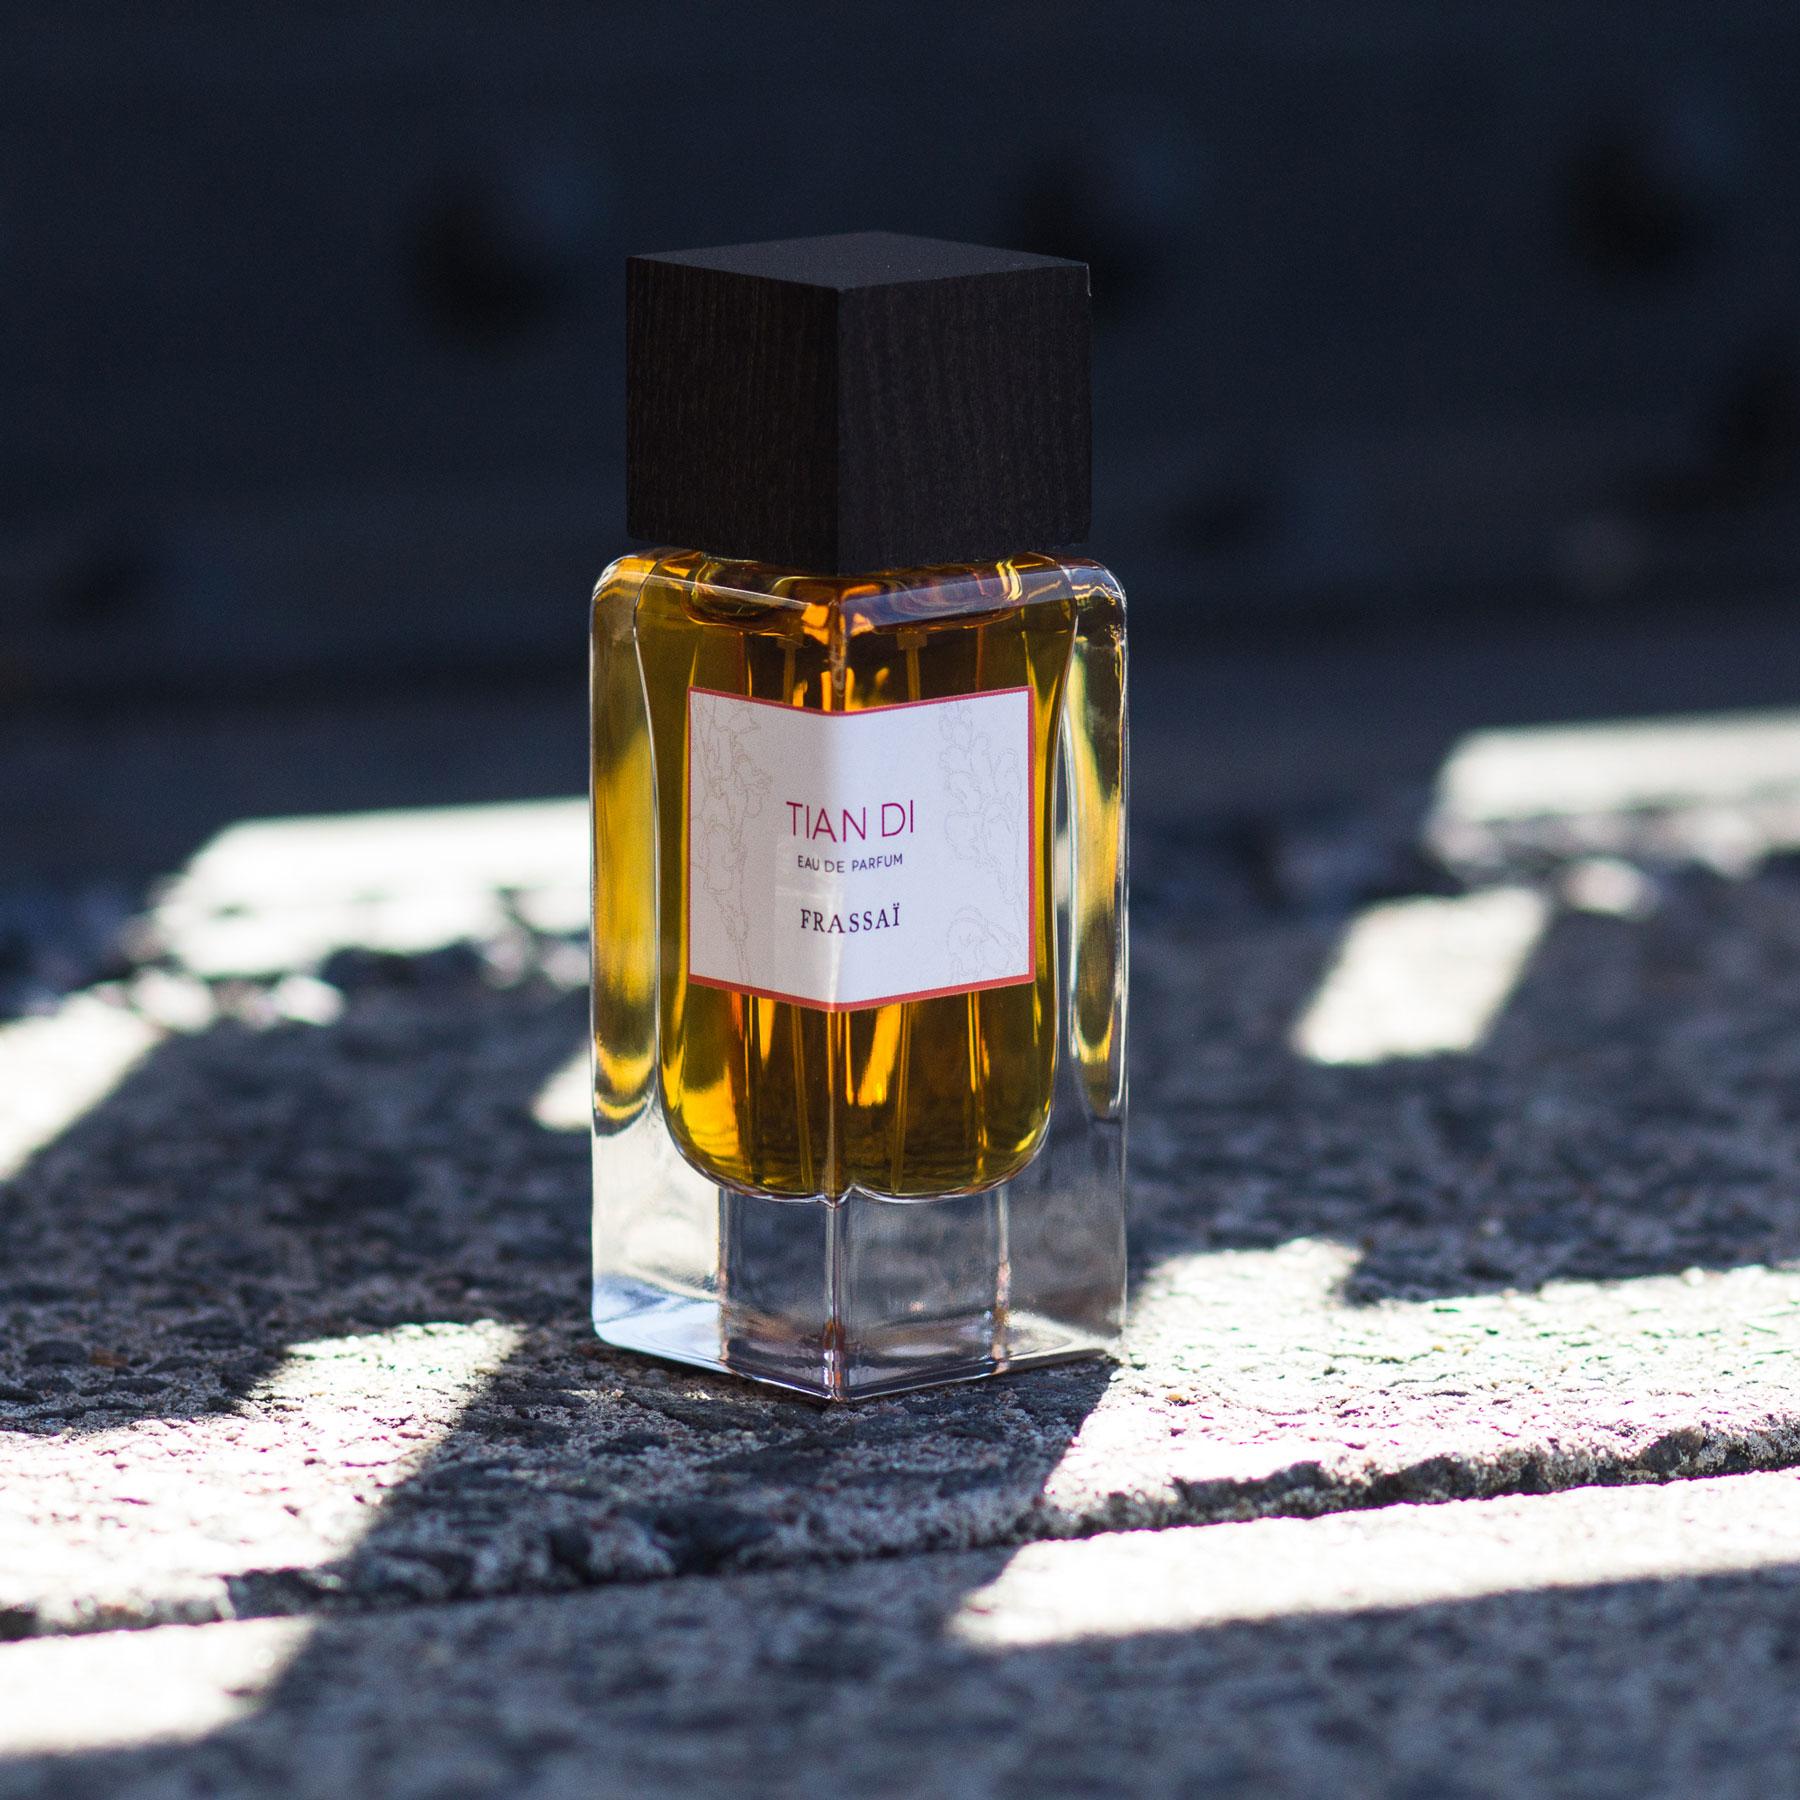 Tian Di eau de parfum Frassai